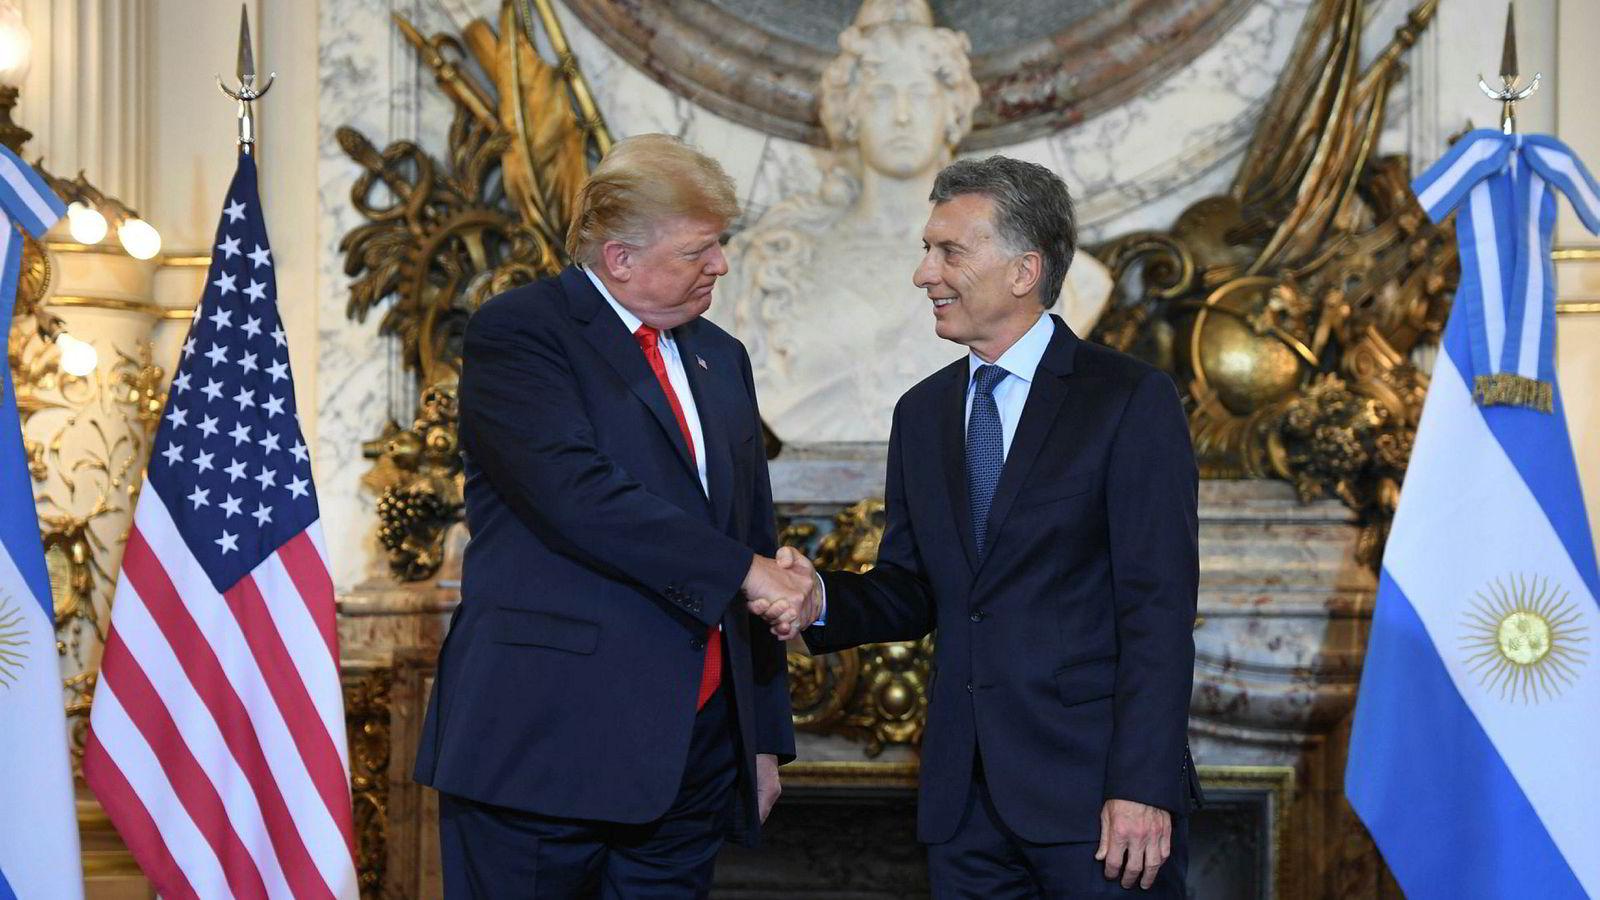 USA president Donald Trump ble fredag morgen ønsket velkommen til Buenos Aires av Argentinas president Mauricio Macri i presidentpalasset Casa Rosada.